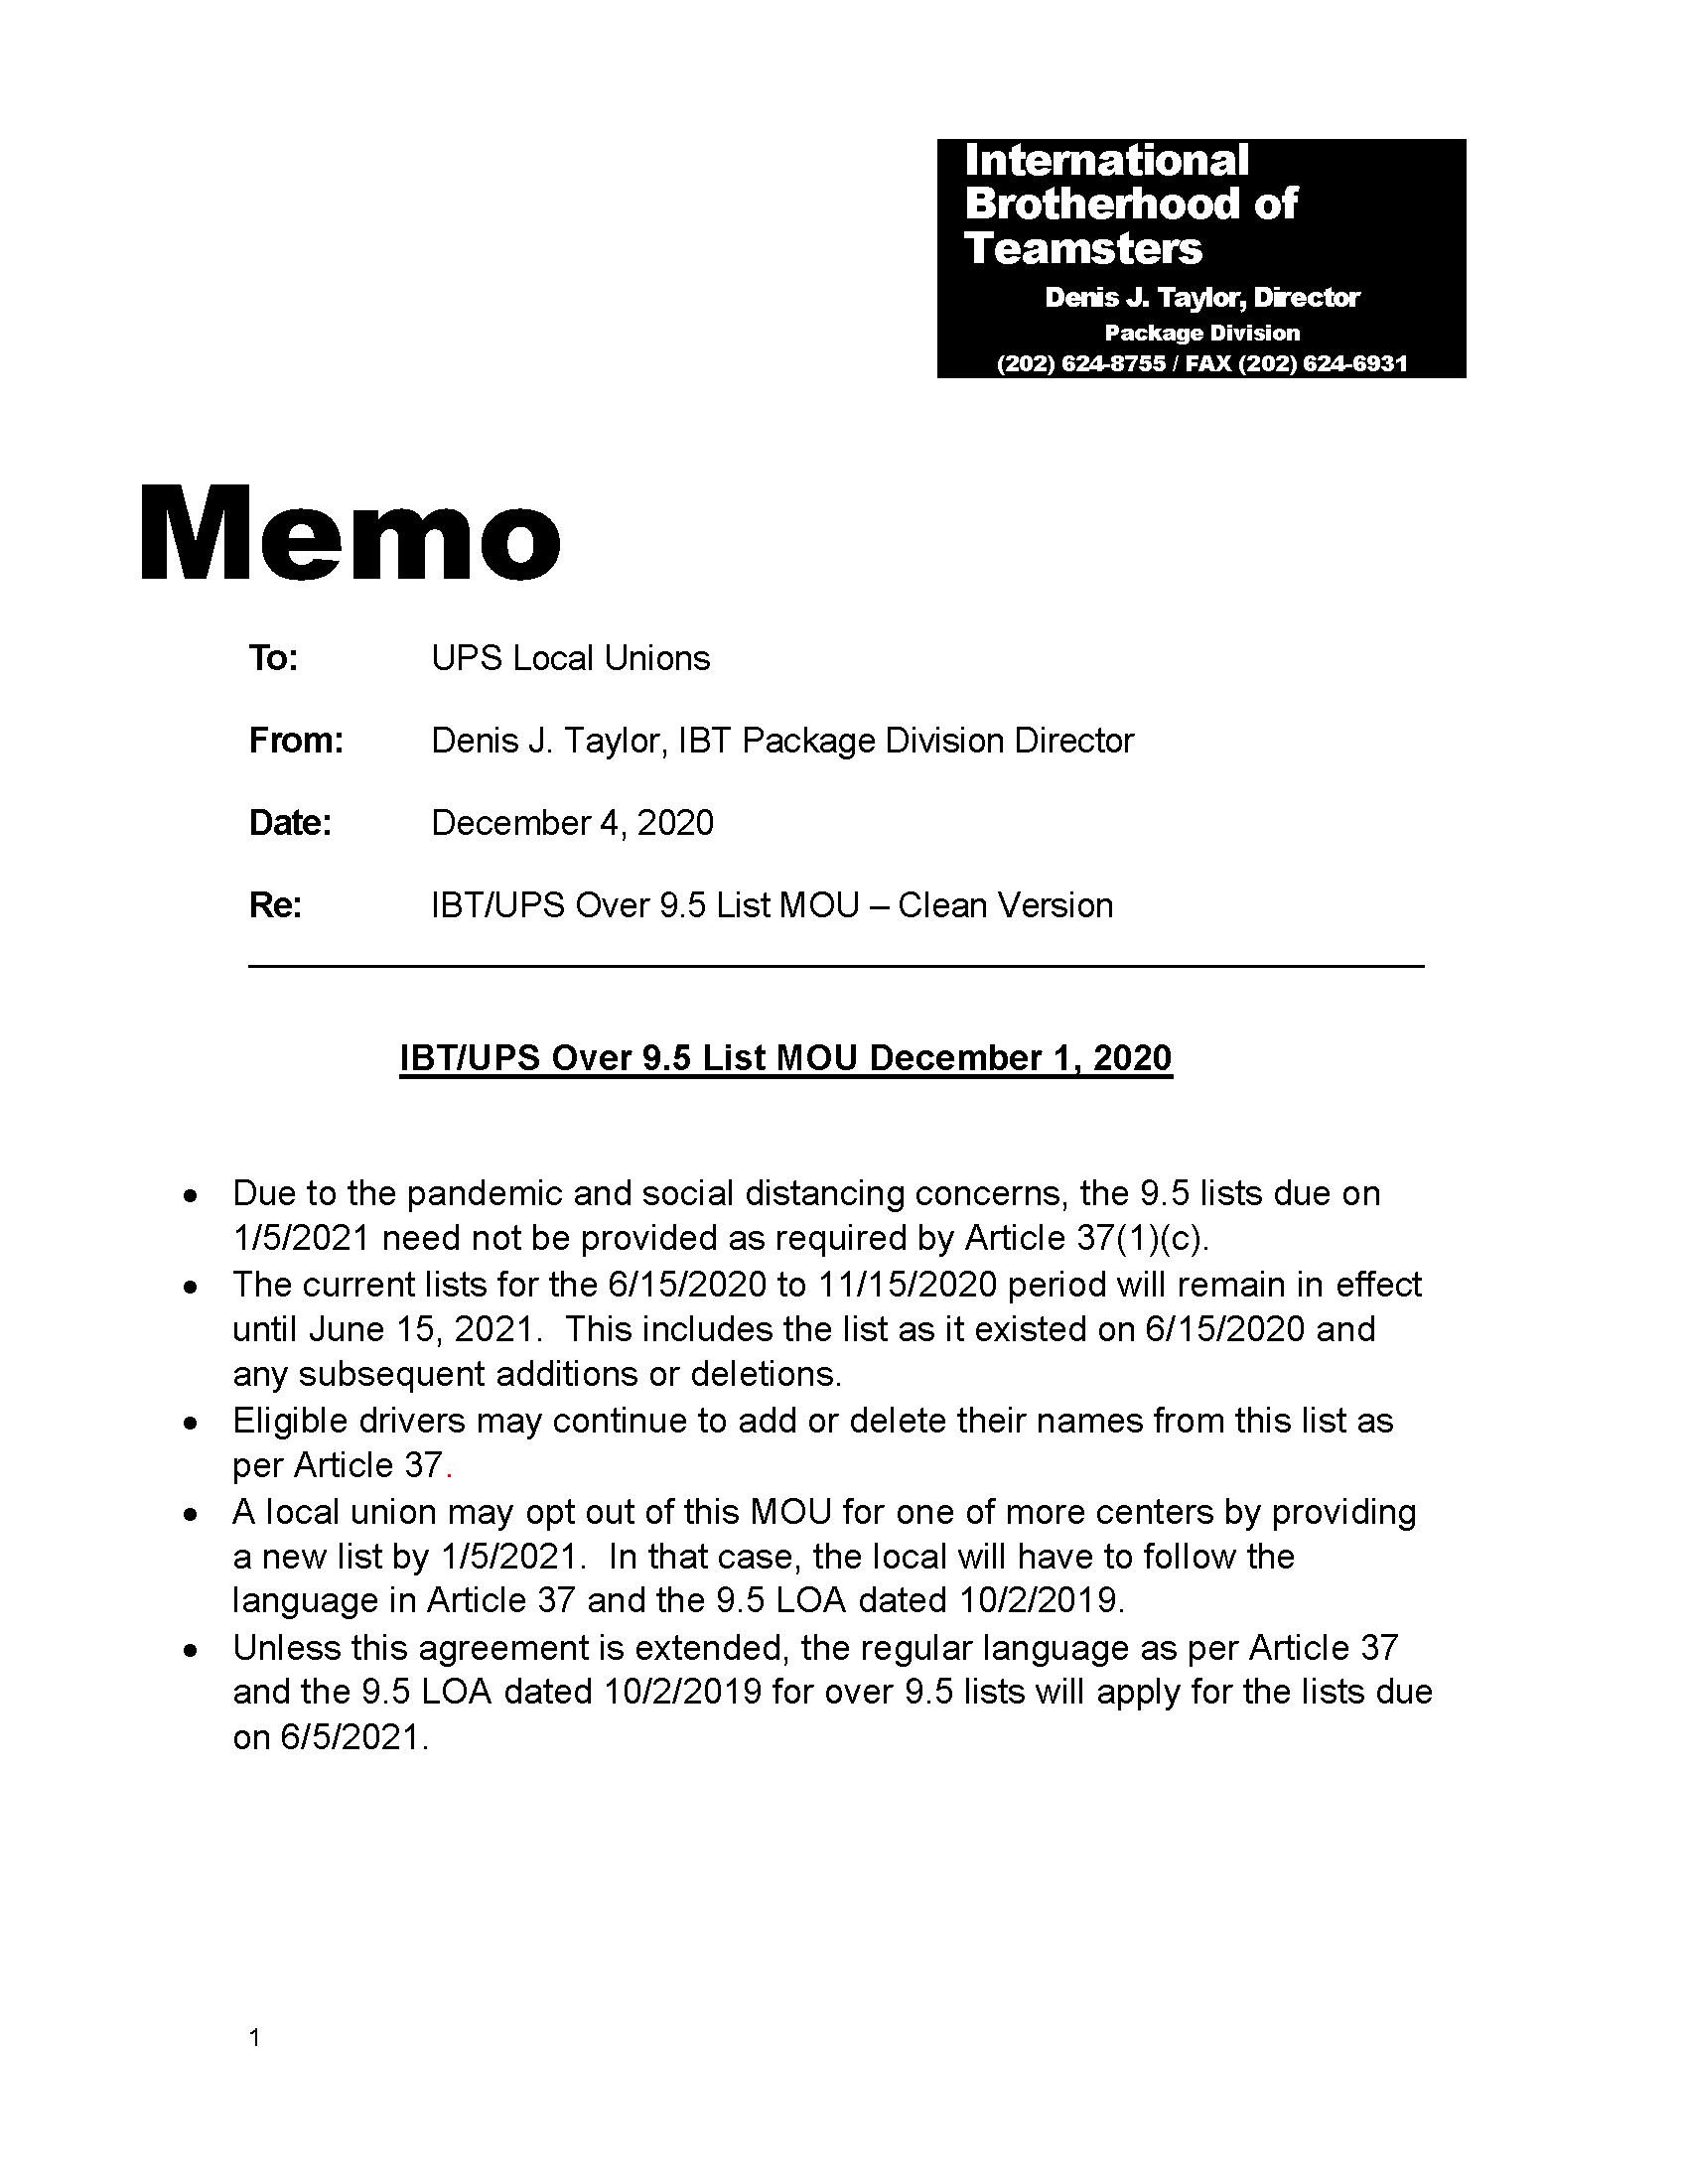 9.5Memo-MOU12-4-2020-CleanVersion.png